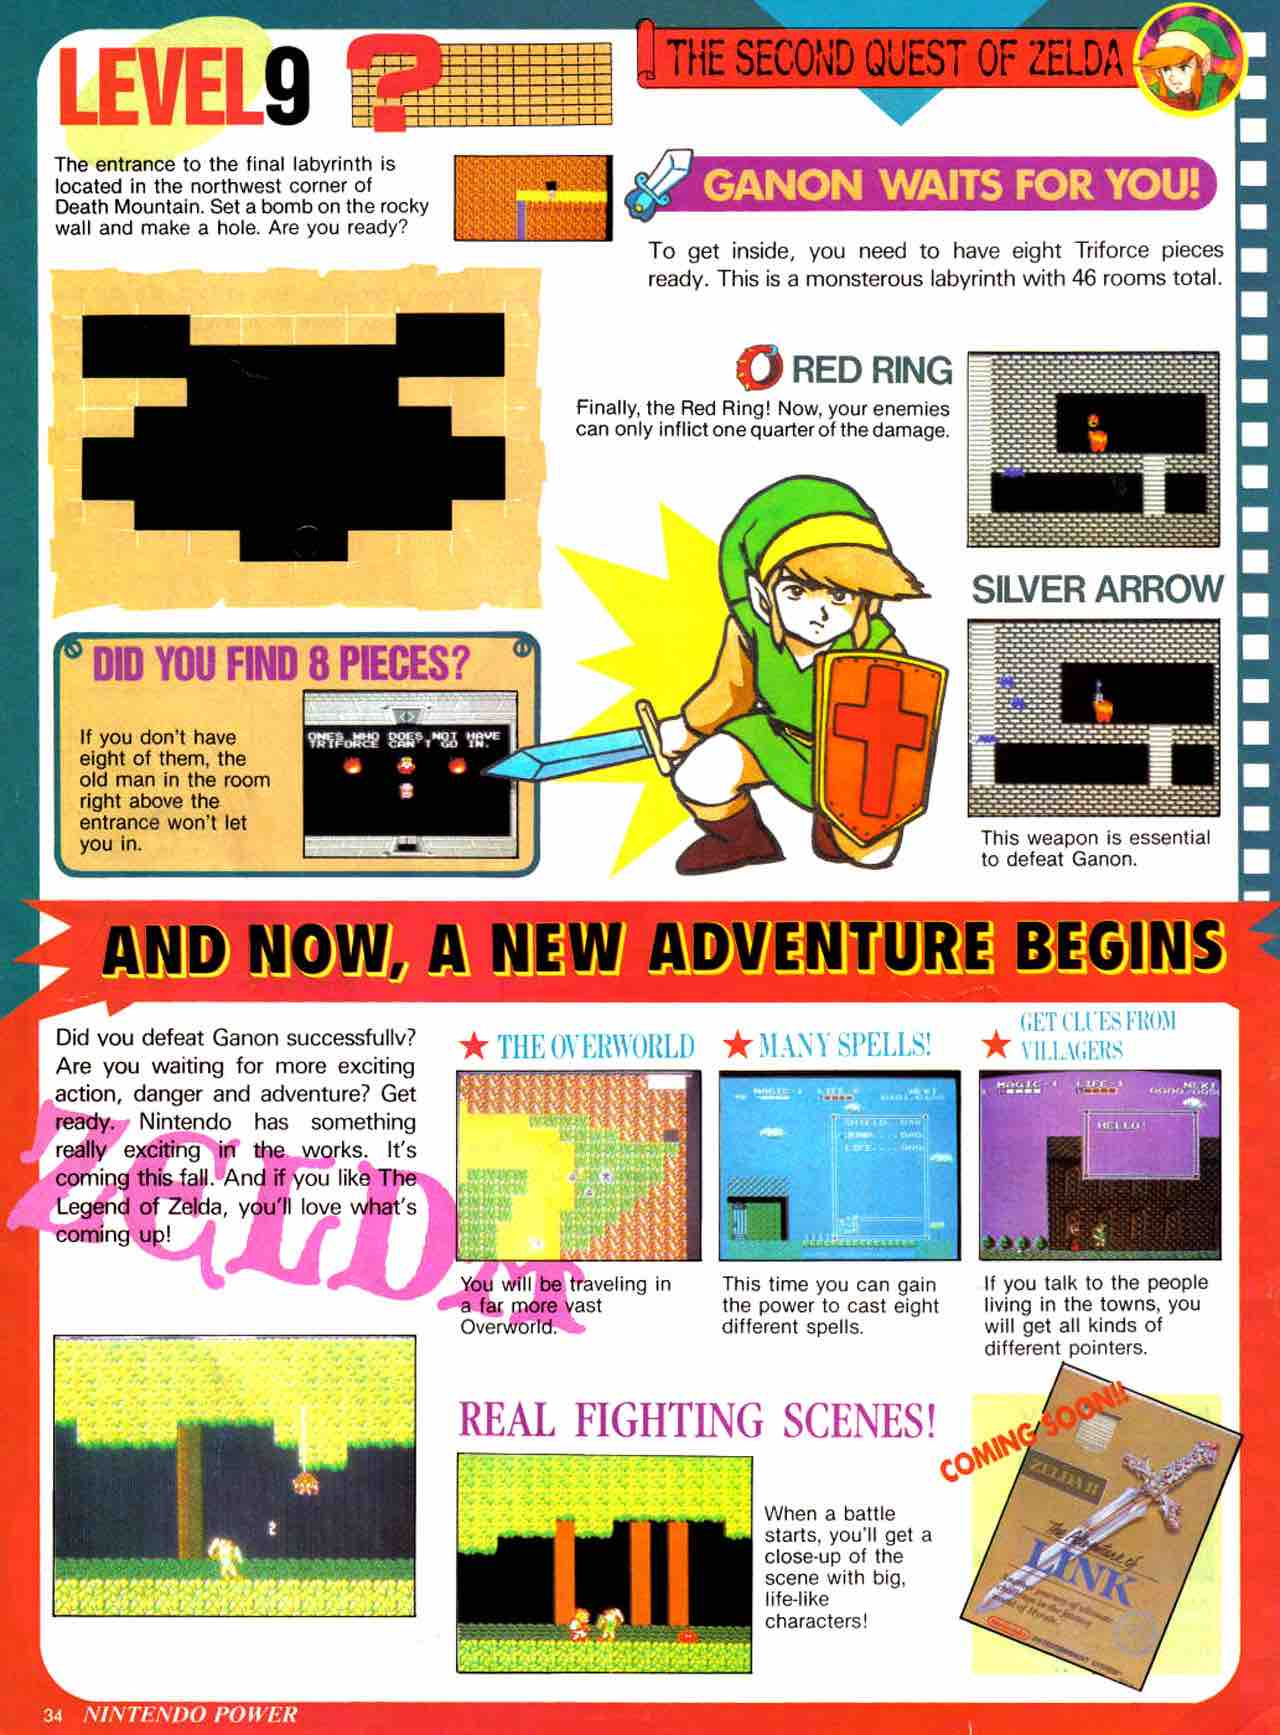 Nintendo Power   July August 1988 - pg 34